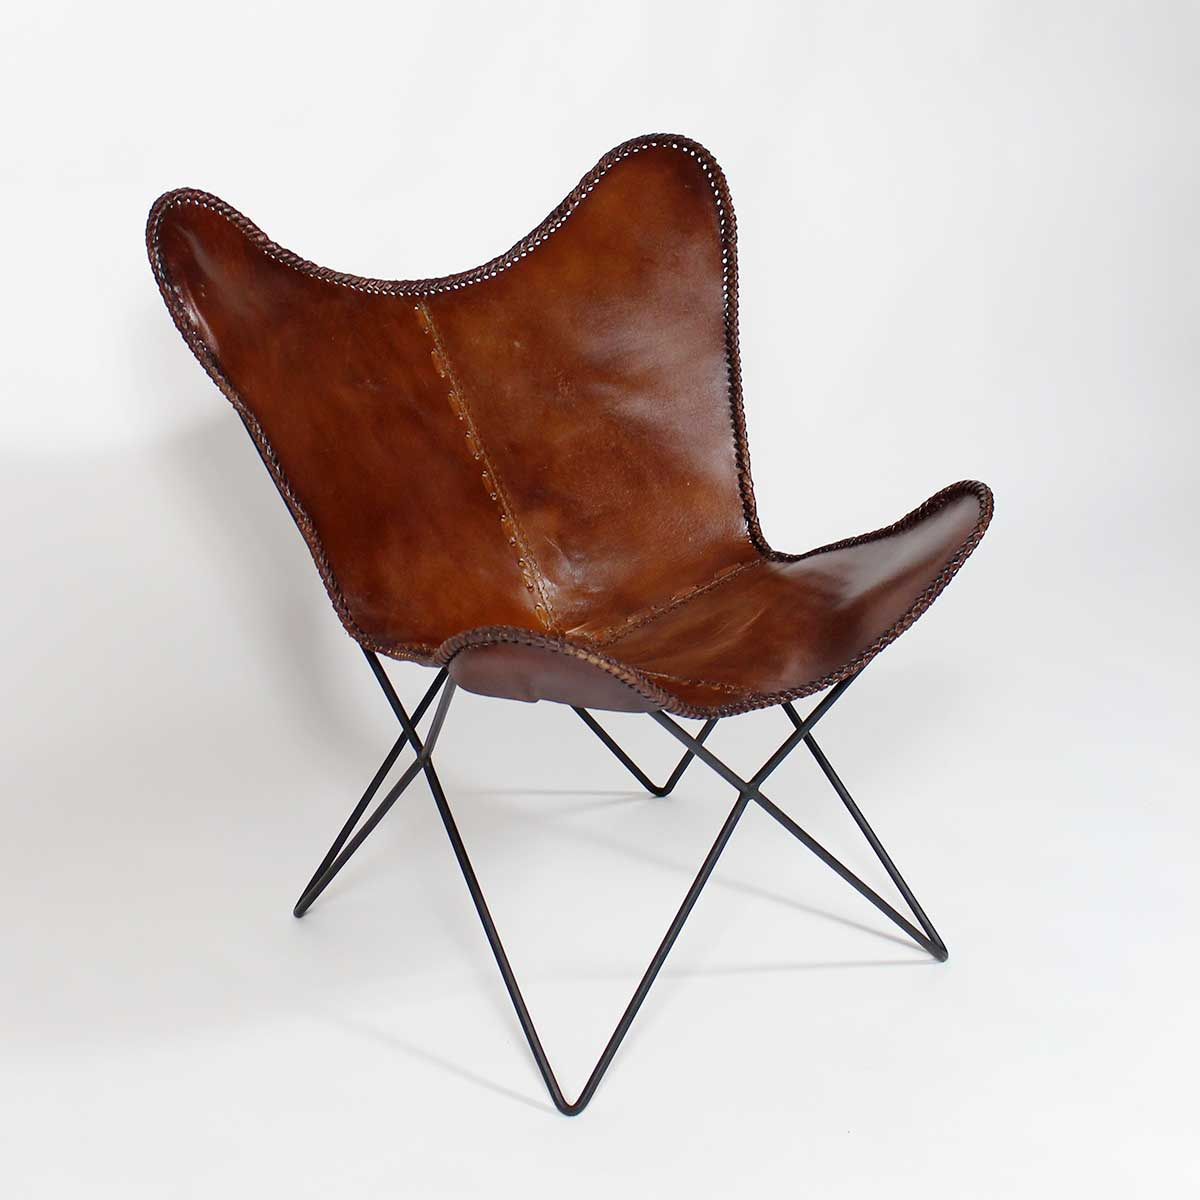 fauteuil papillon cuir marron